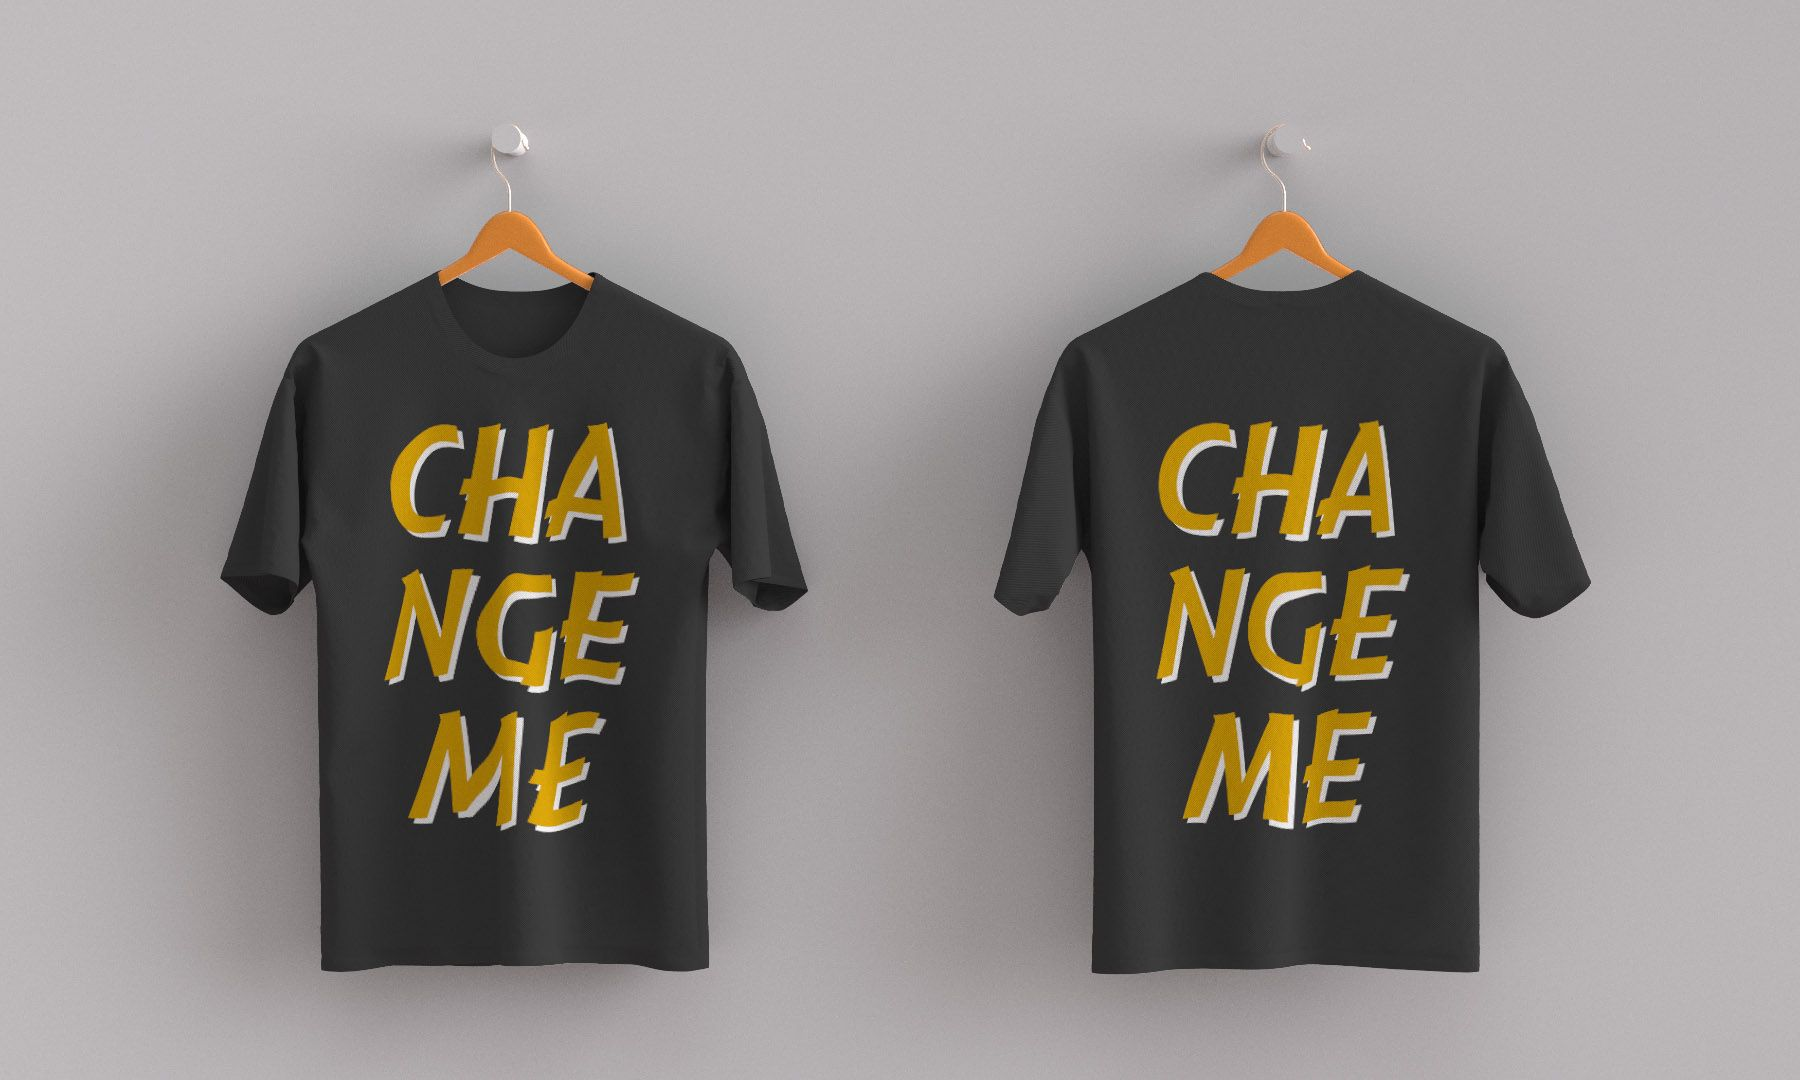 Download T Shirt Free Mockup On Behance Shirt Mockup Tshirt Mockup Photoshop Mockup Free